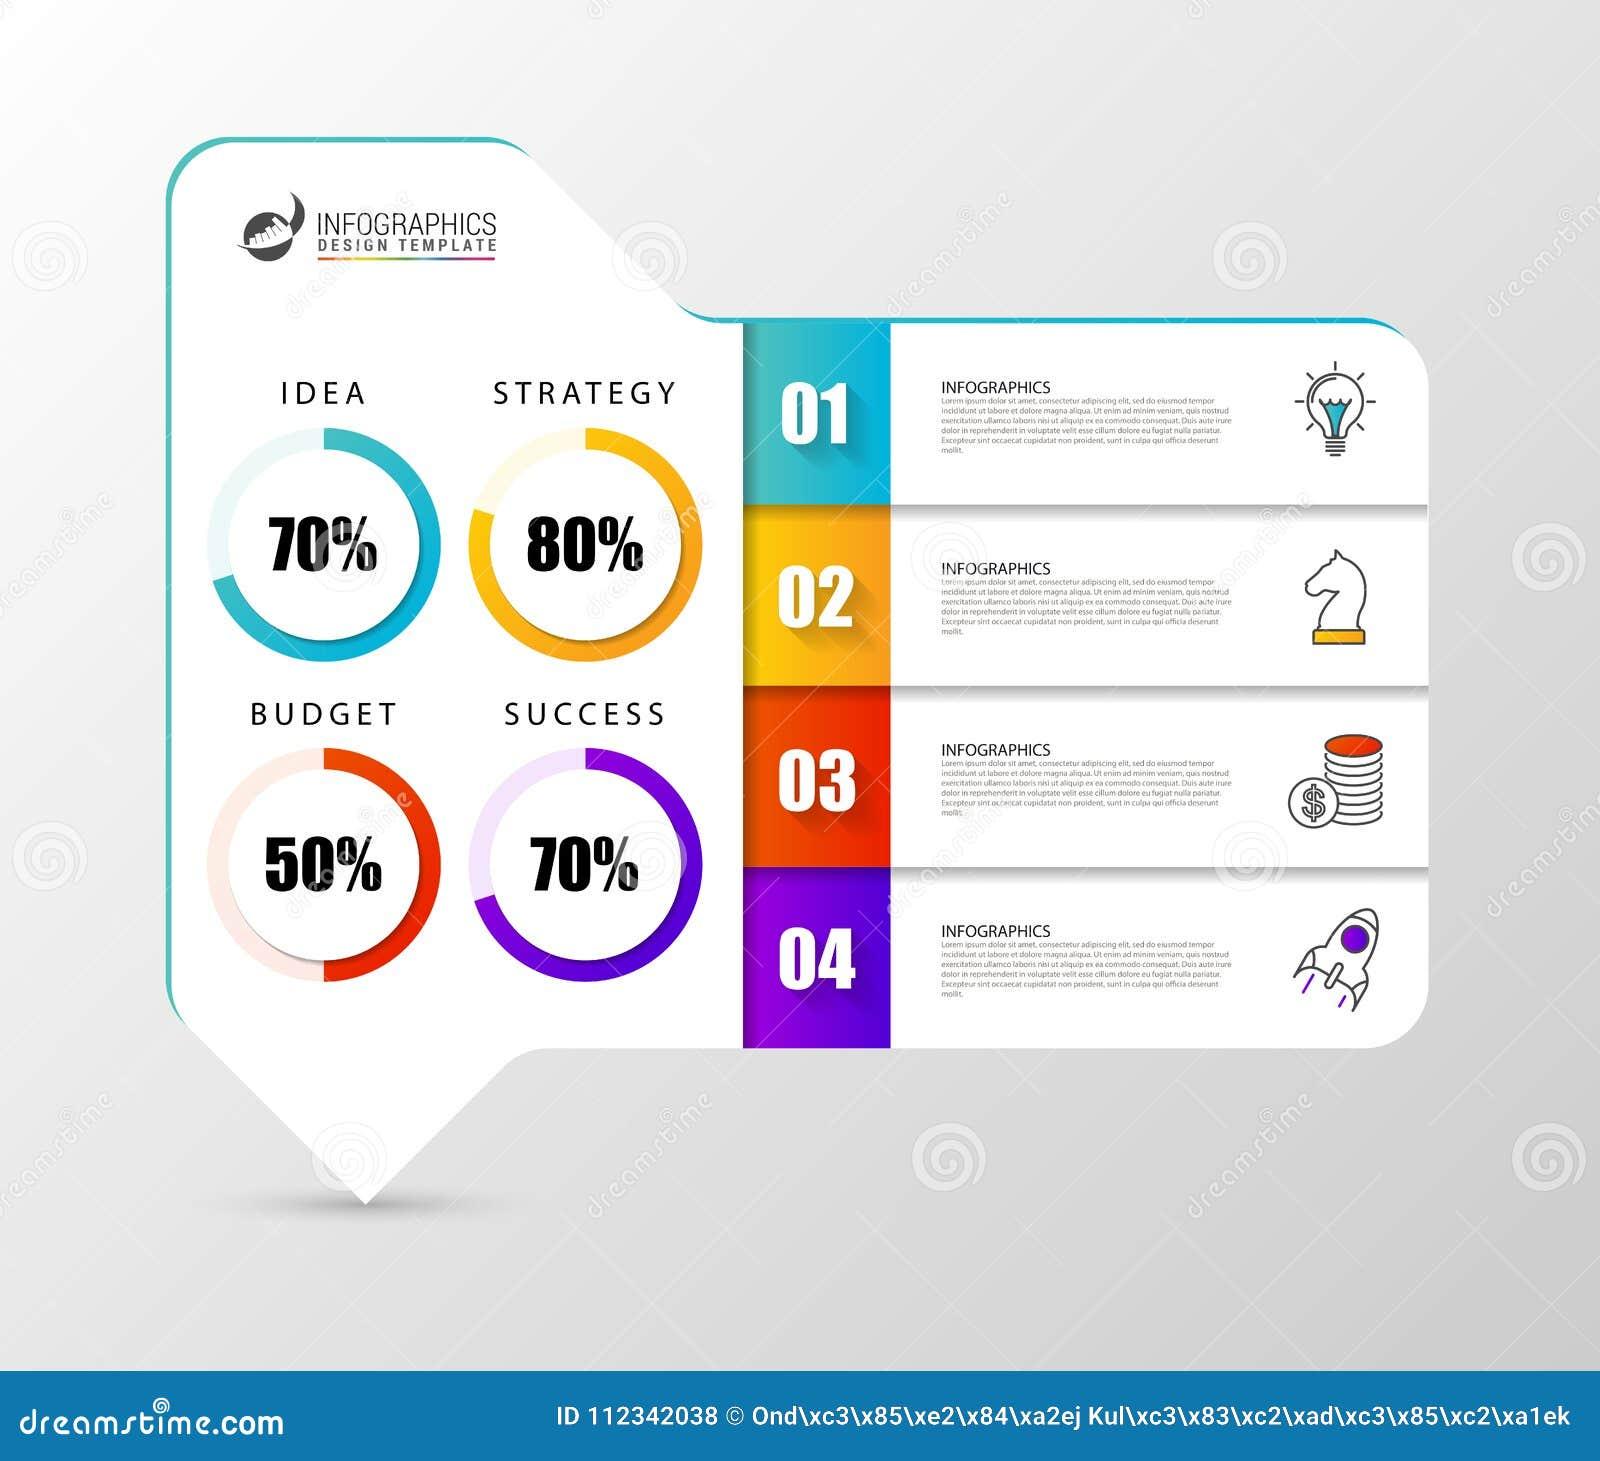 Infographic设计模板 与4步的组织系统图